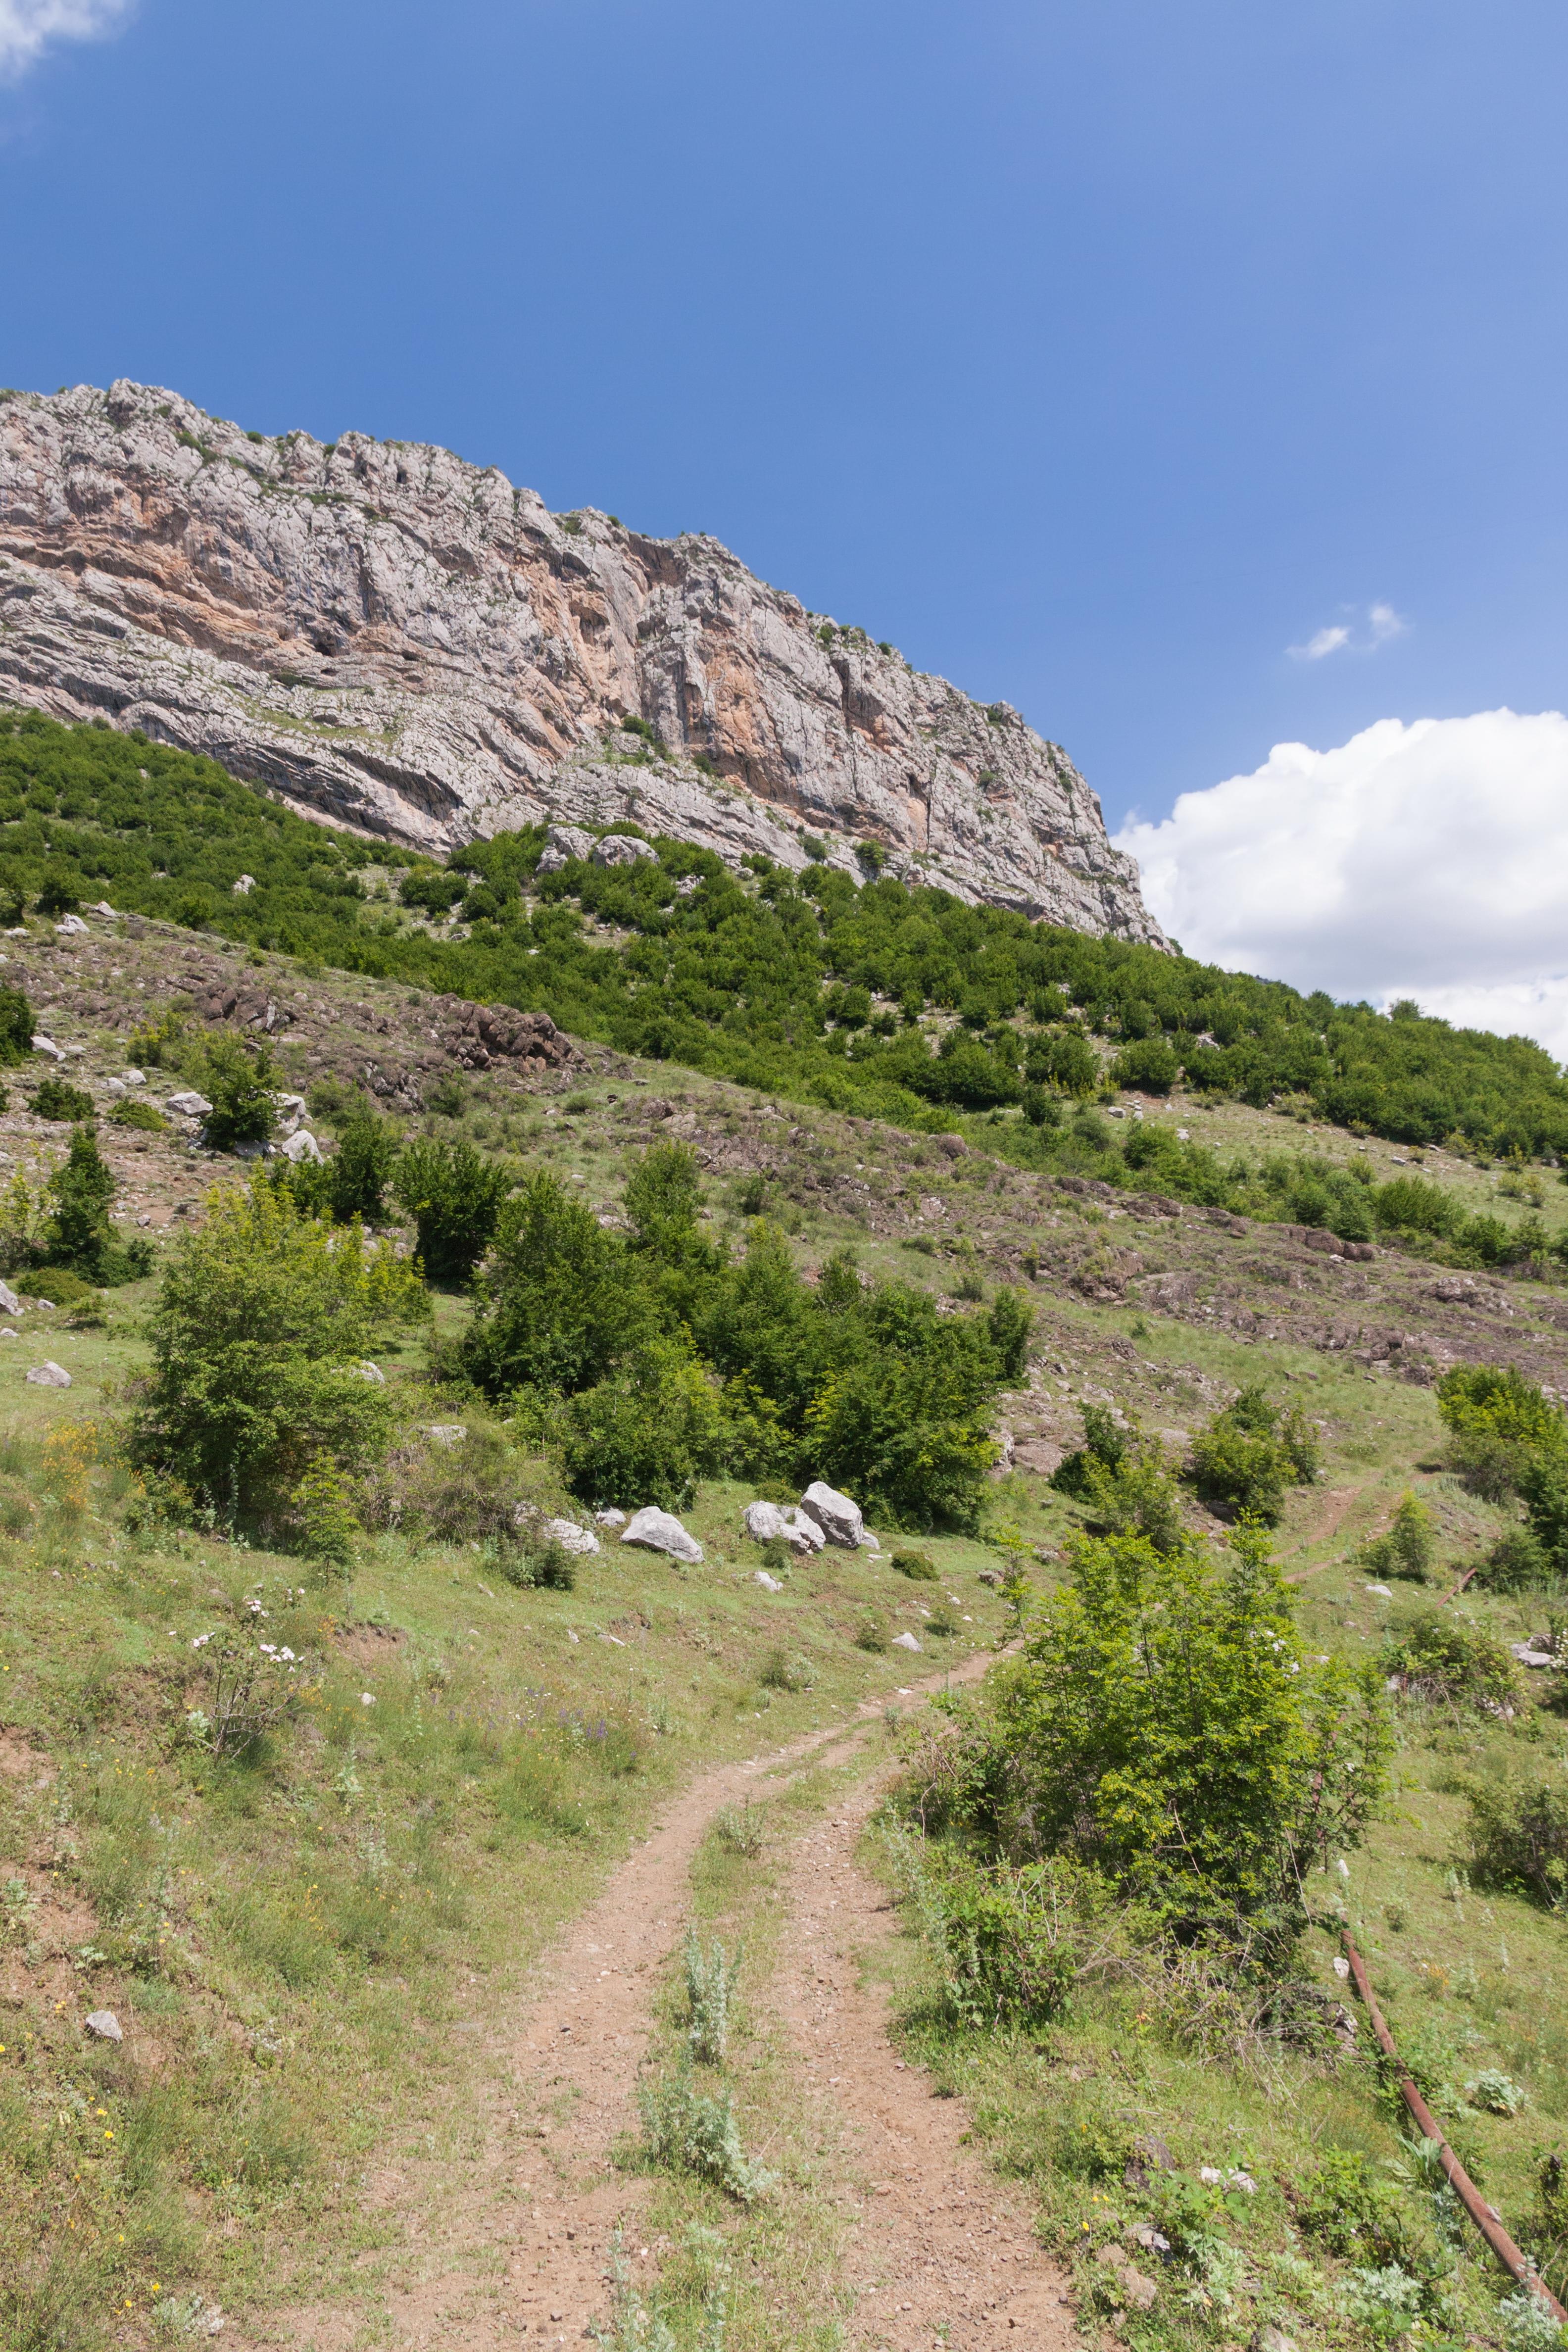 Janapar Trail – Travel guide at Wikivoyage